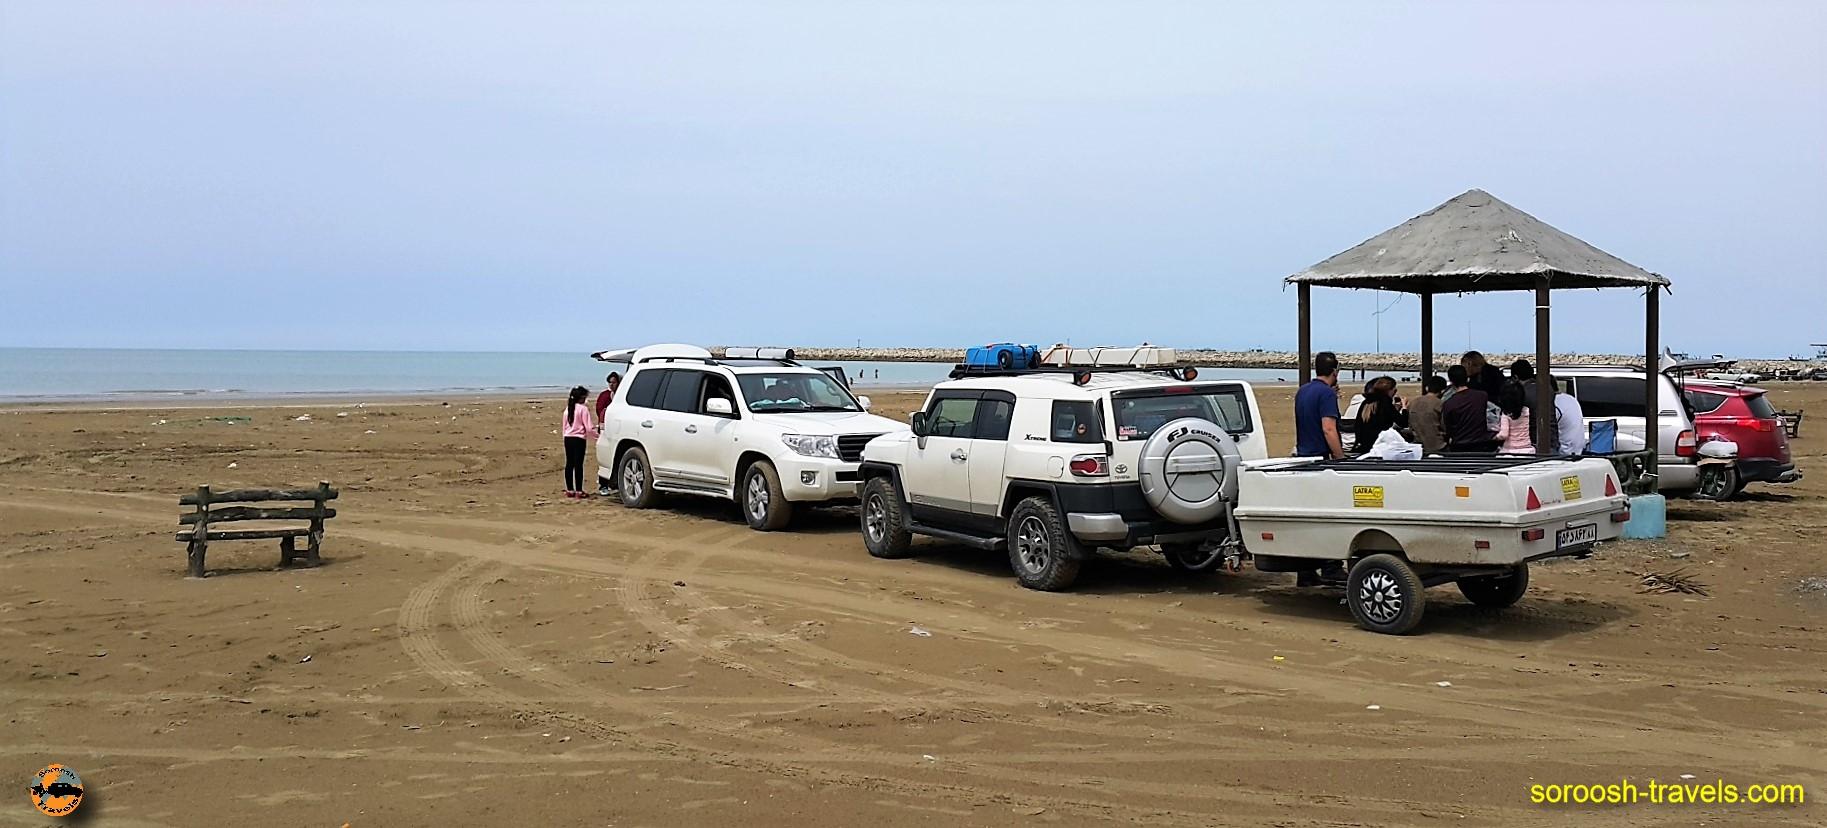 سواحل تنگه هرمز - نوروز ۱۳۹۶